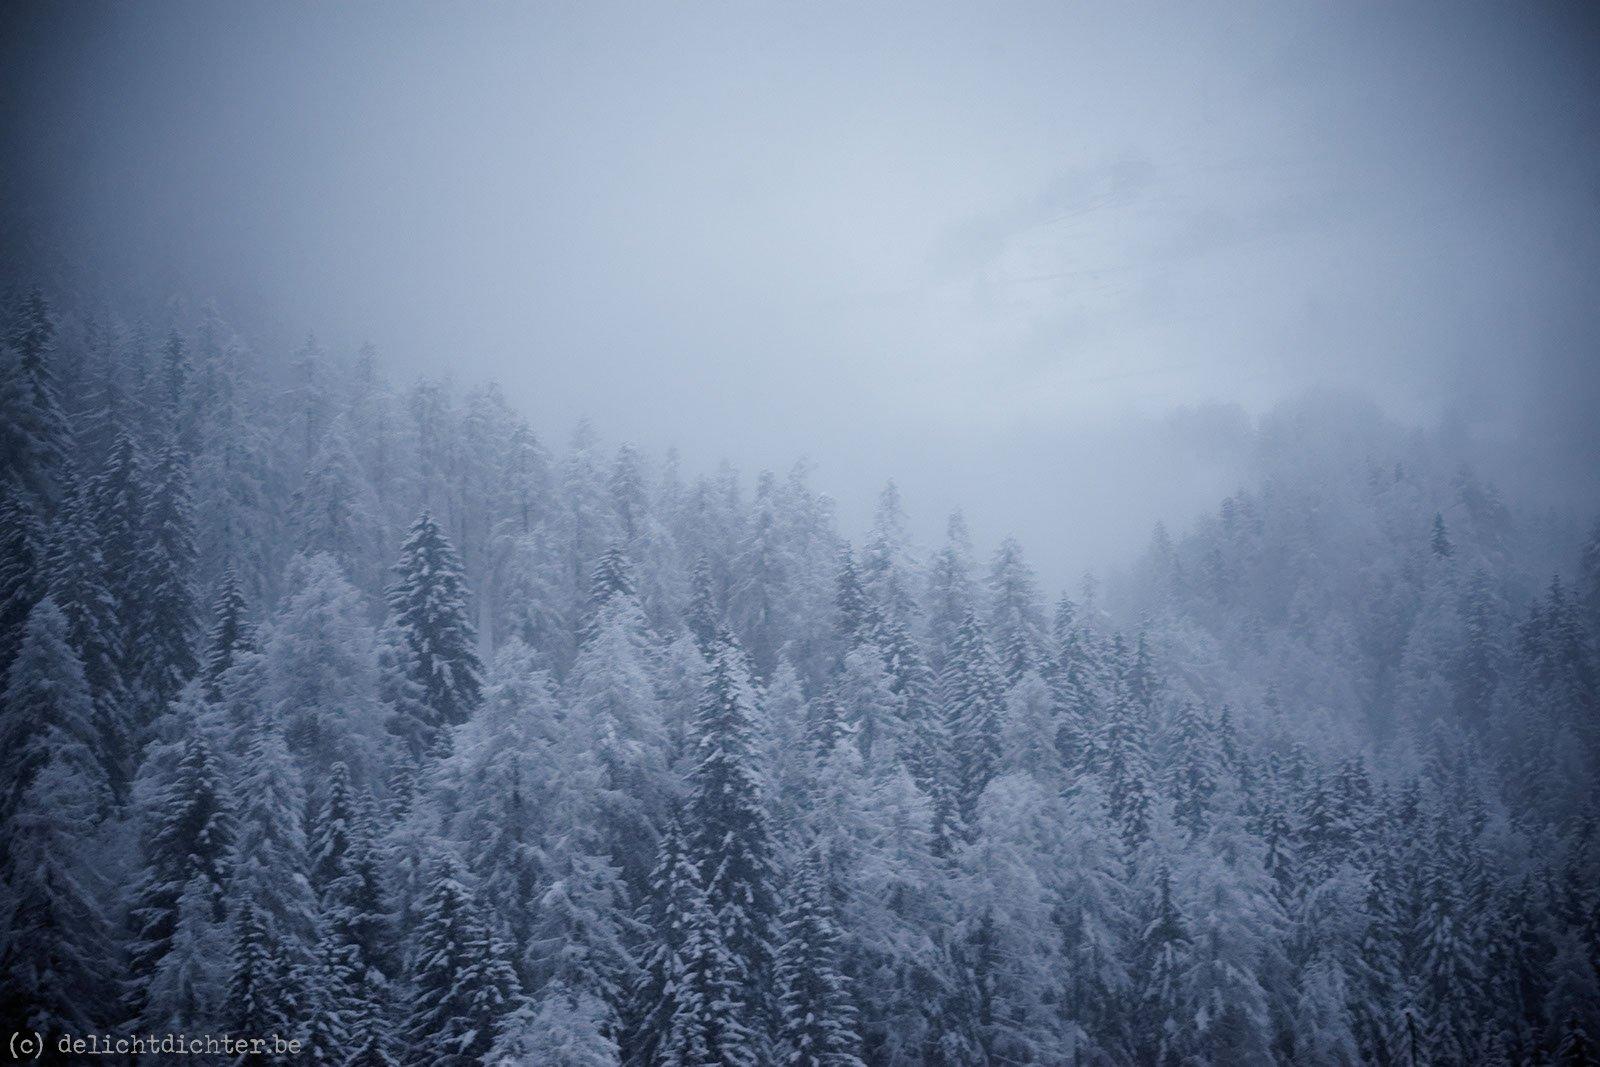 2013_12_sneeuwschoenen_20131229_075008_dxo_v9